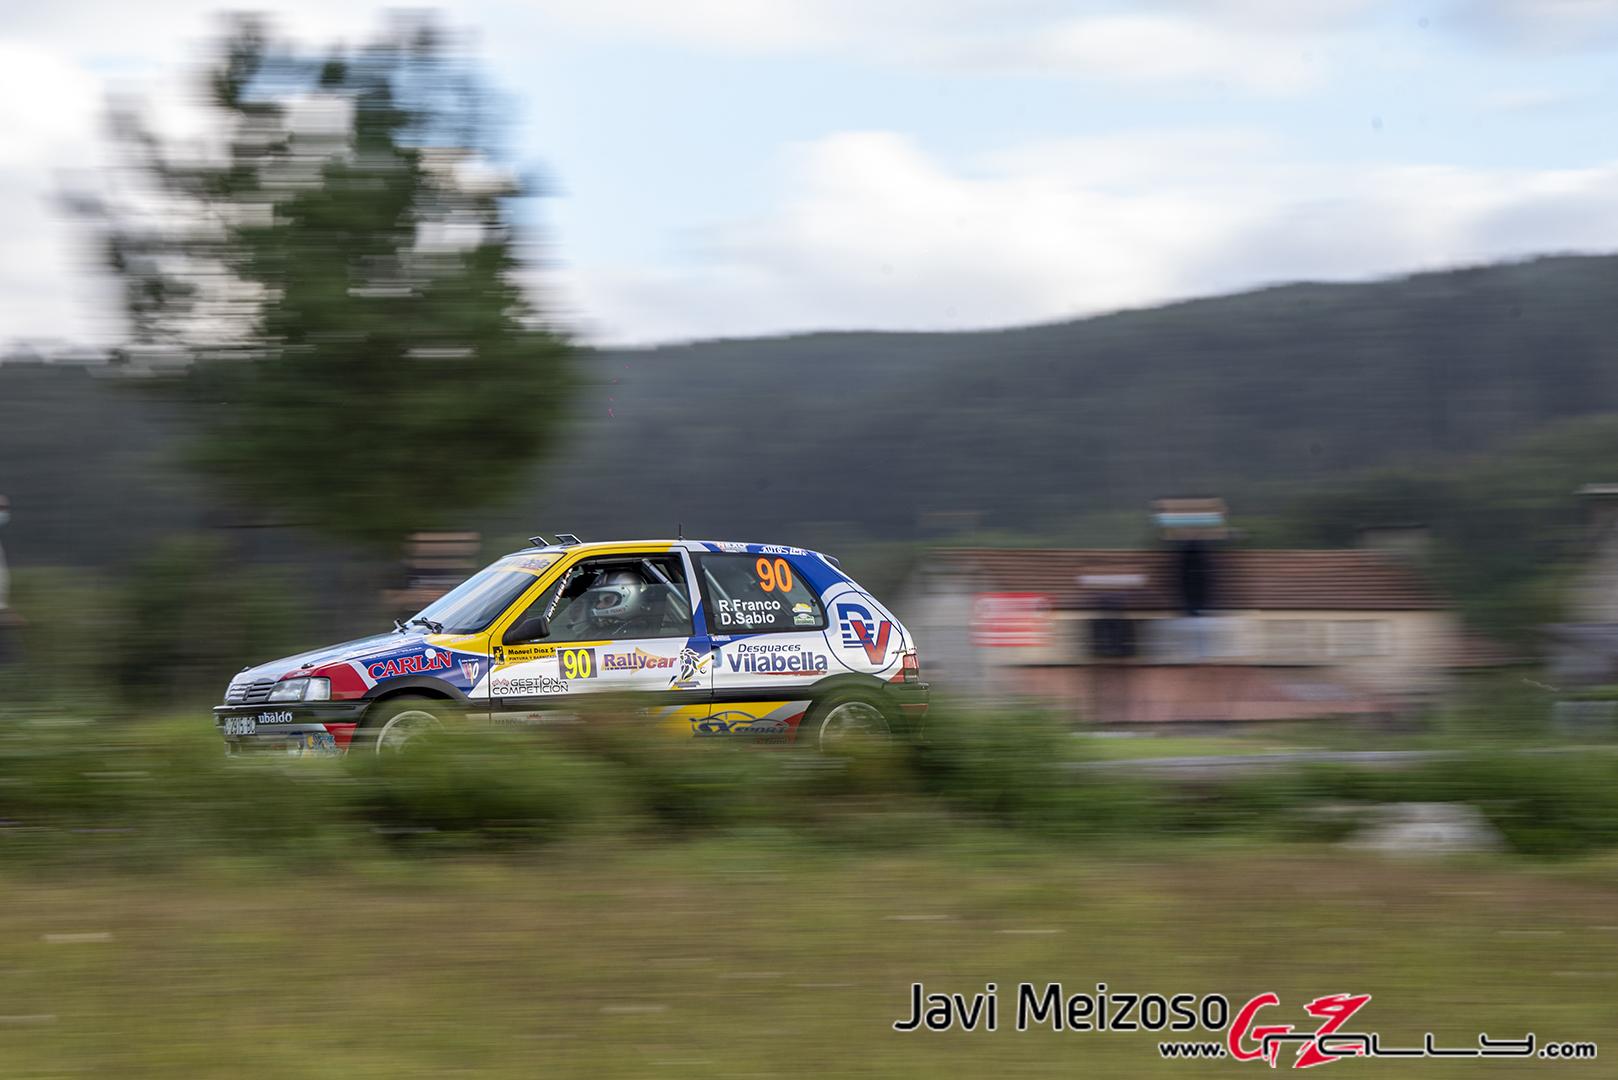 Rally de Ferrol 2020 - Javi Meizoso